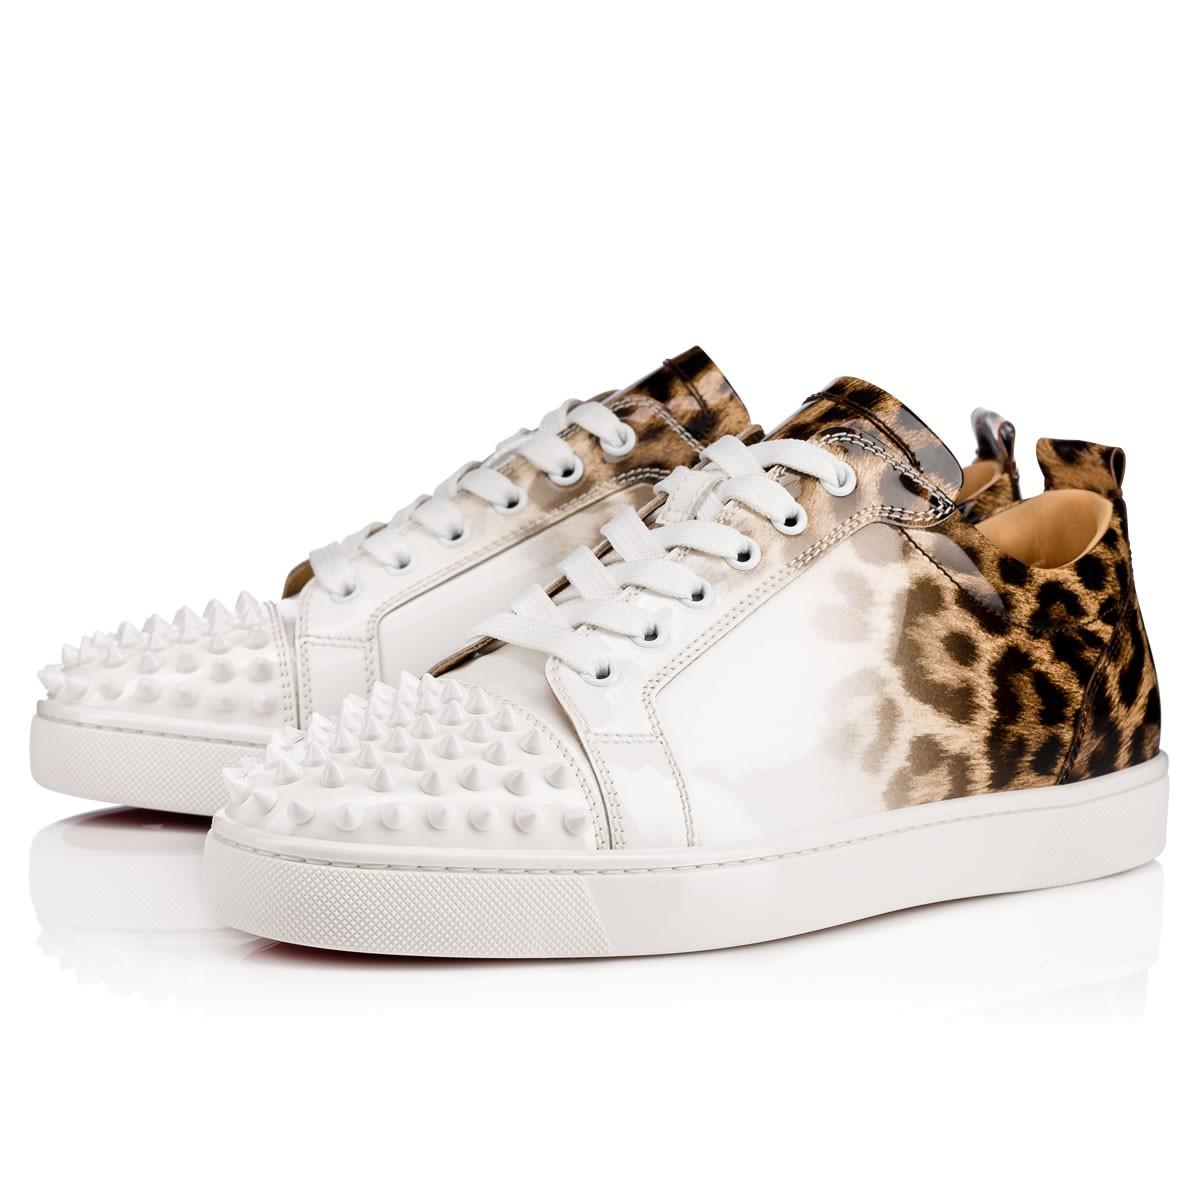 9470edb3f8b Louis Junior Spikes Men's Flat Latte-Leopard Patent Leather